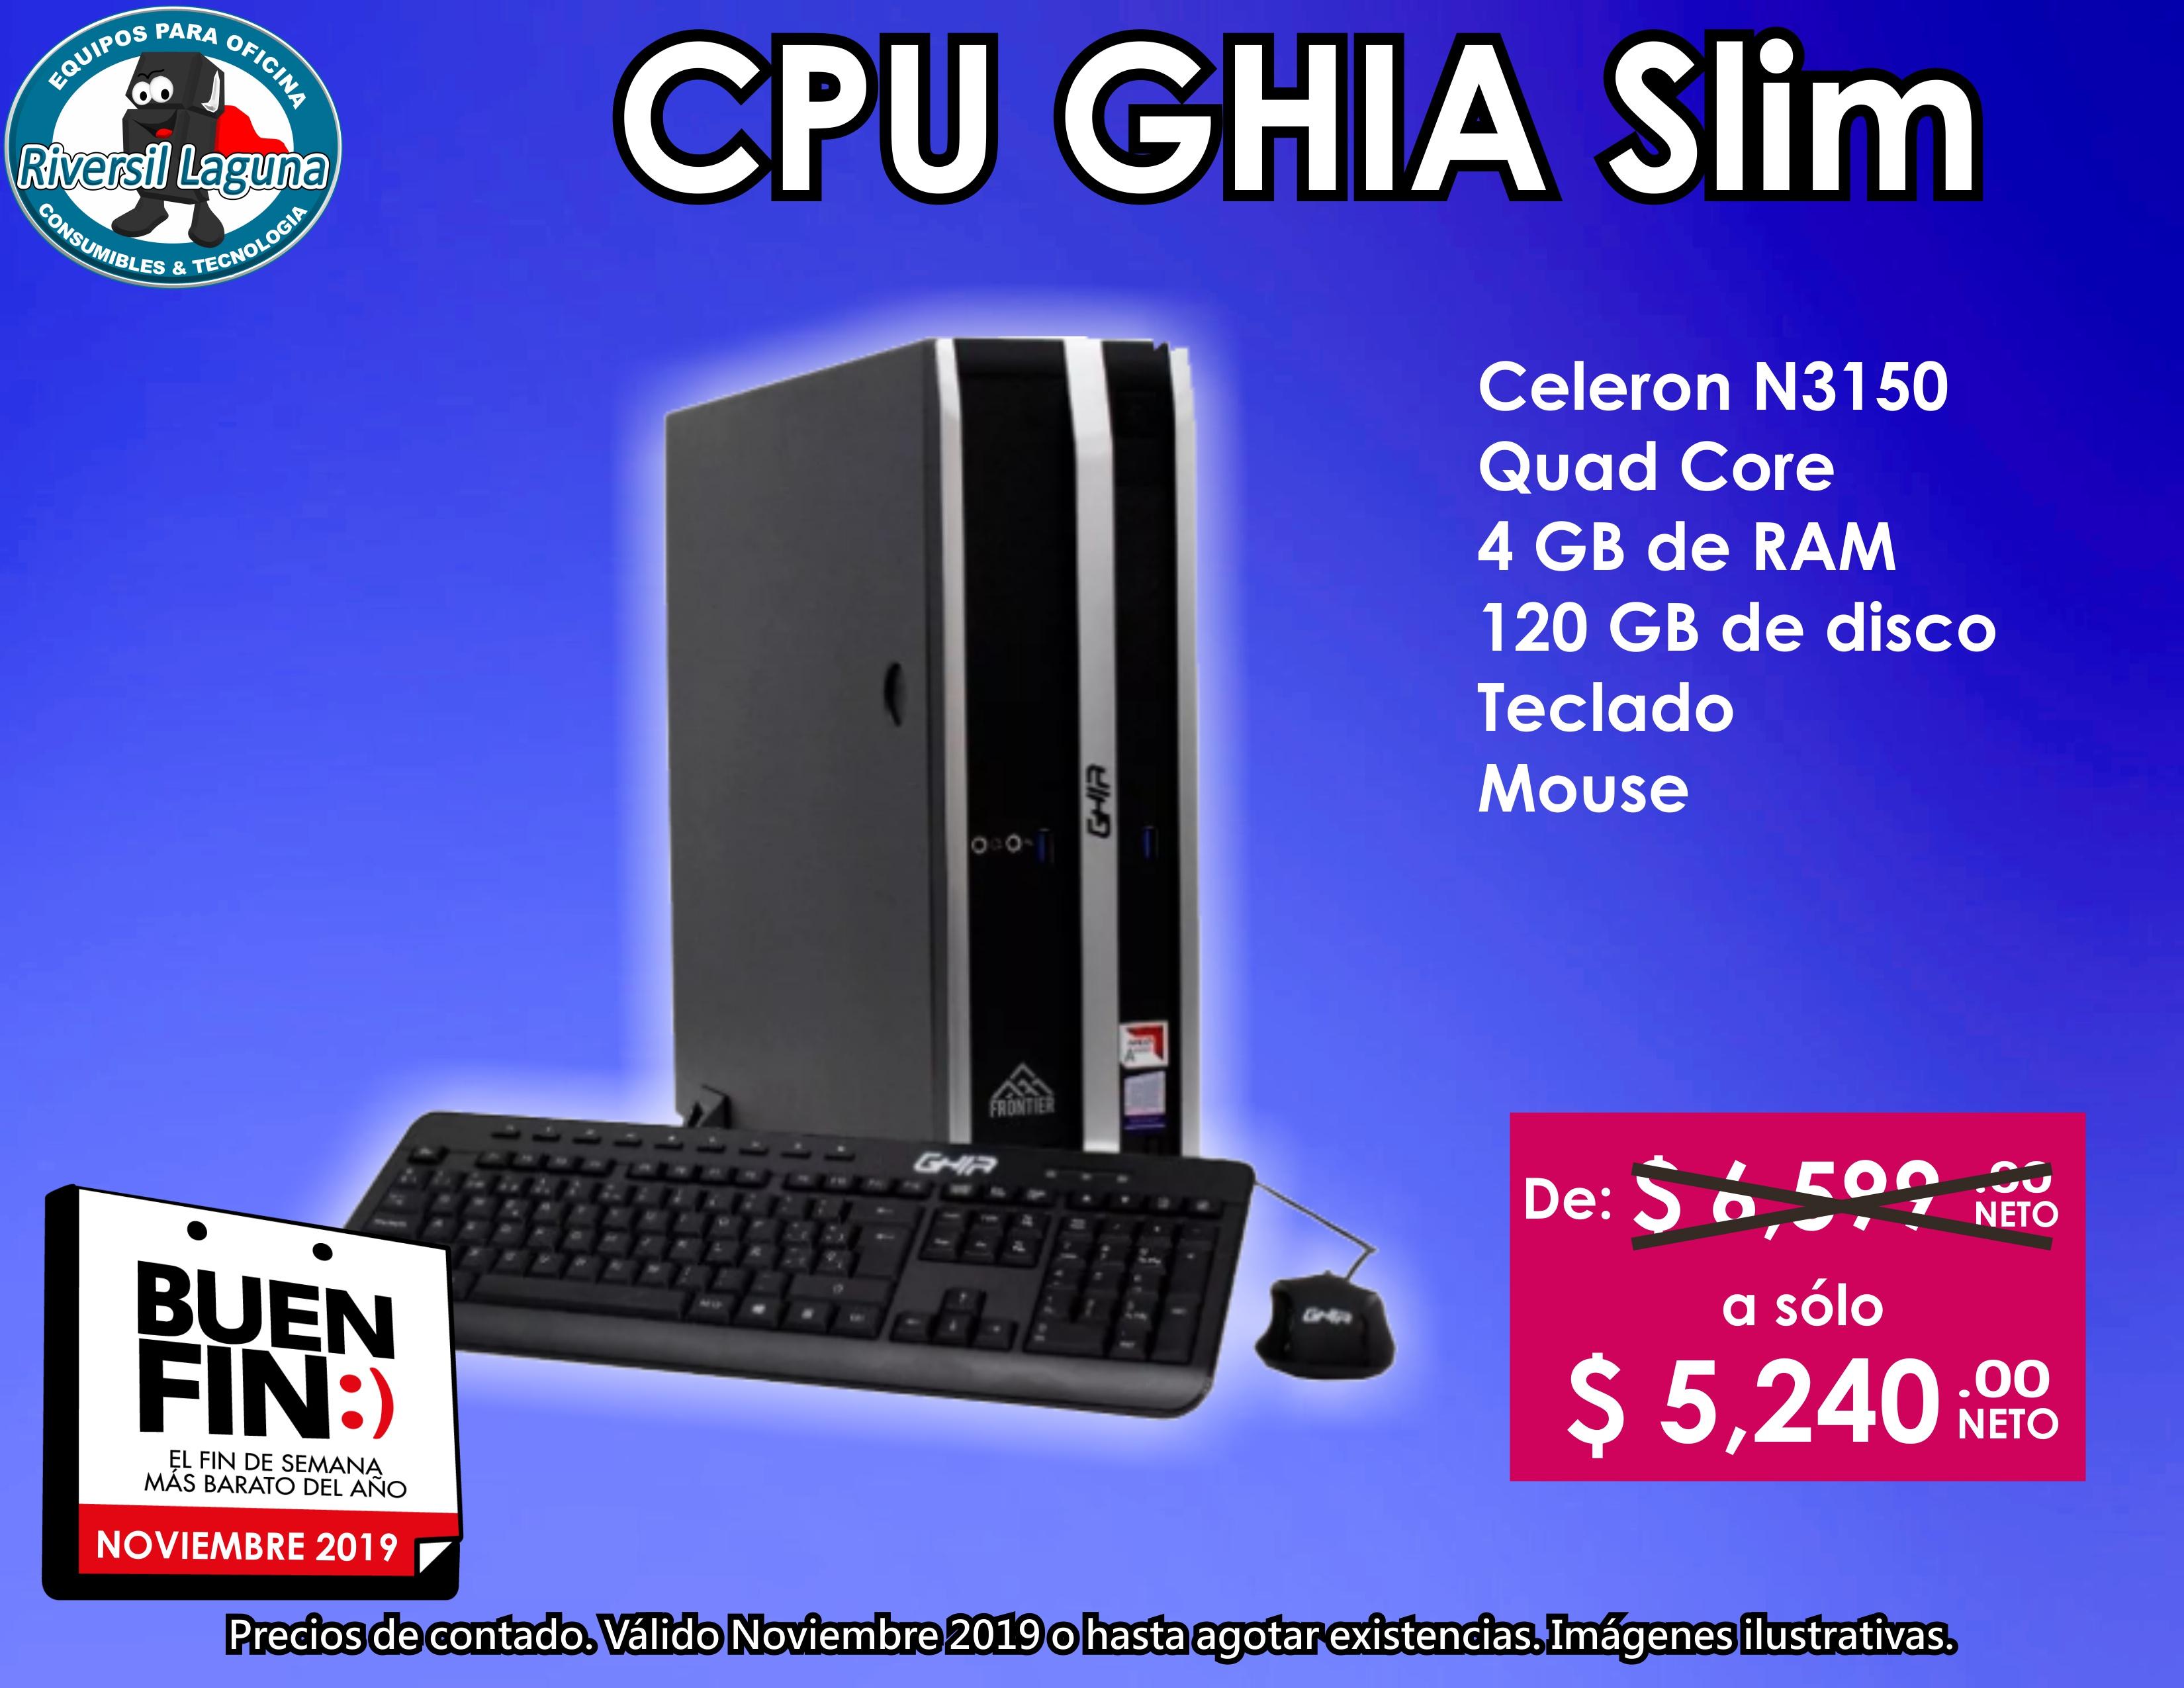 https://0201.nccdn.net/1_2/000/000/088/31f/6-CPU-GHIA-SLIM-3300x2550.jpg